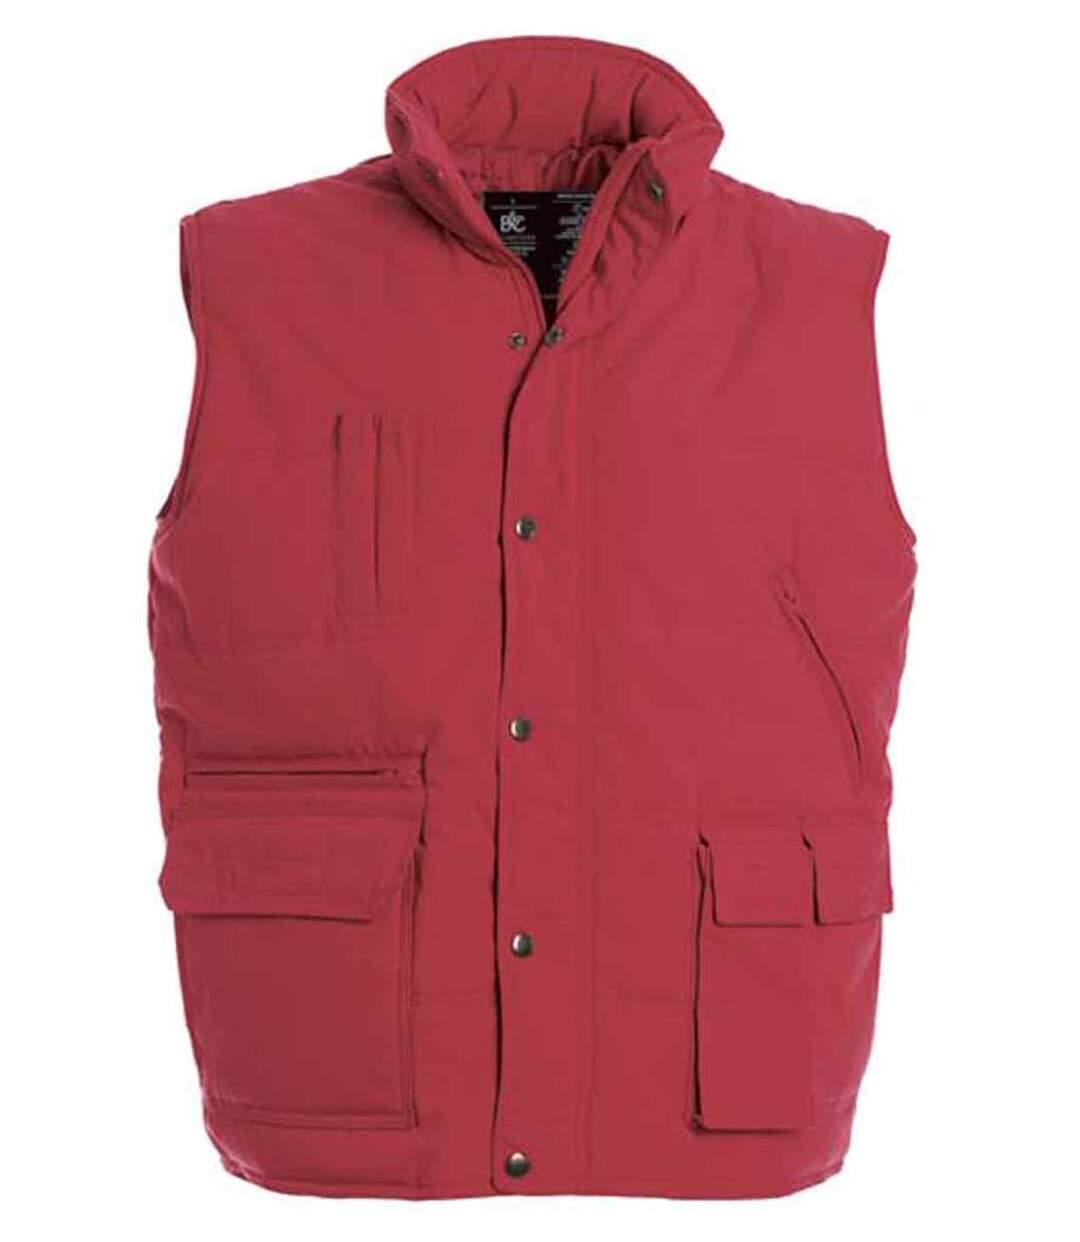 Doudoune anorak homme sans manches - Bodywarmer JU880 - rouge